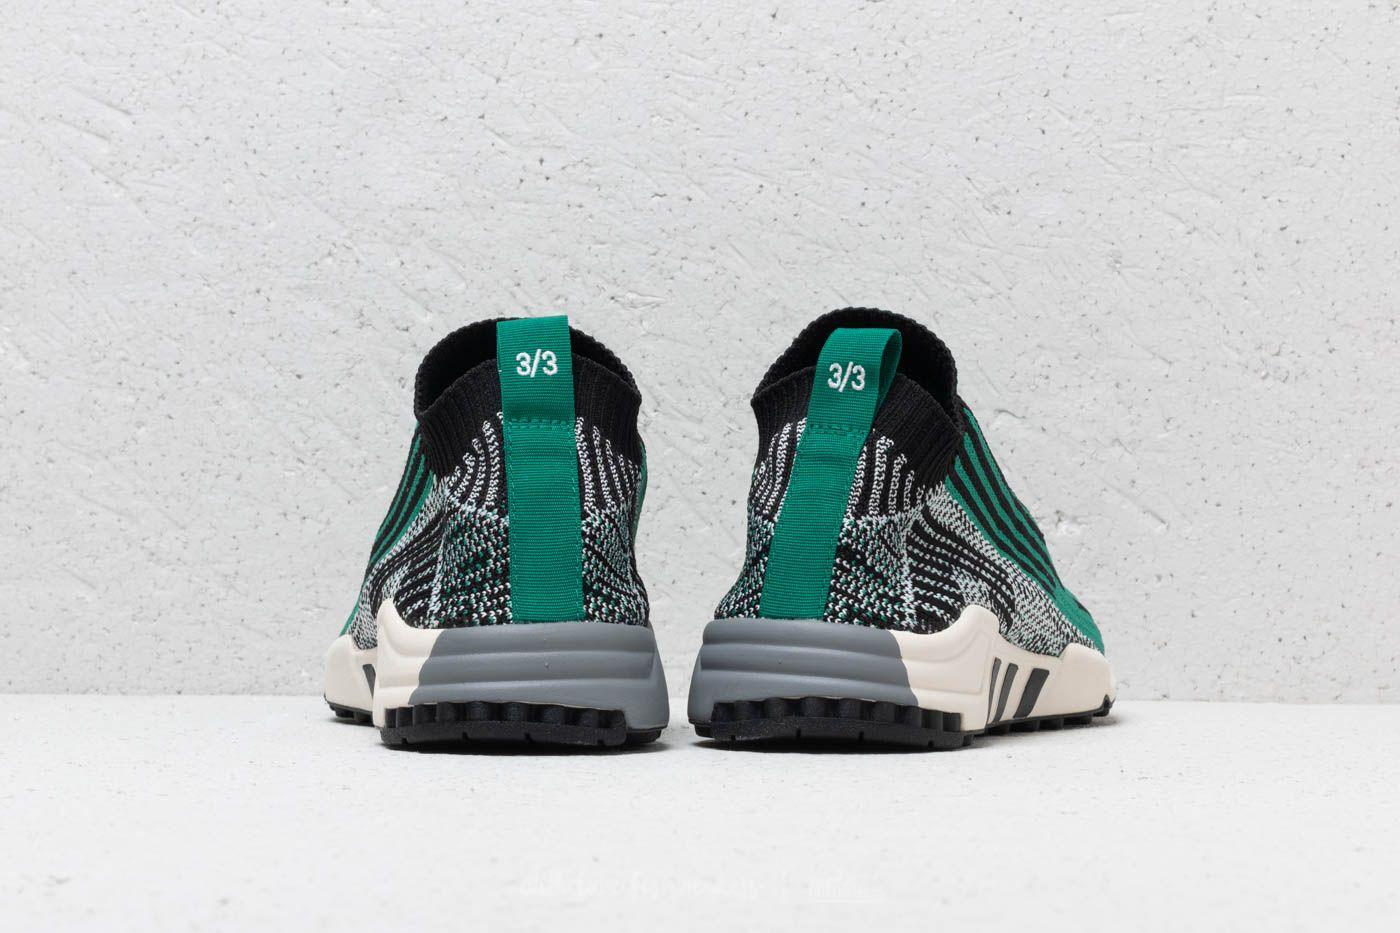 adidas EQT Support SK Primeknit Core Black Sub Green Ftw White   Footshop